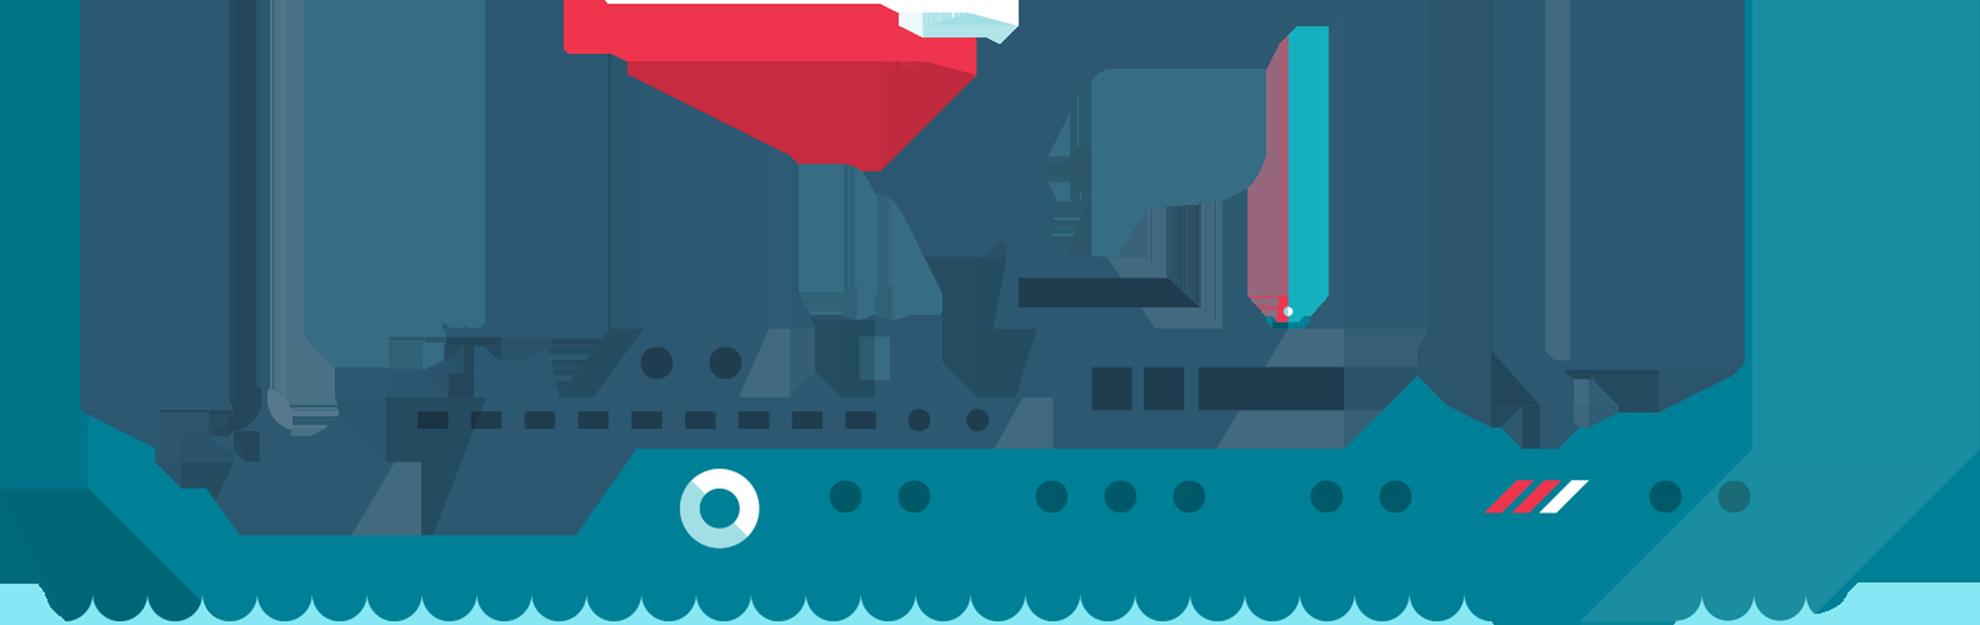 EdmarServices_WarShip2